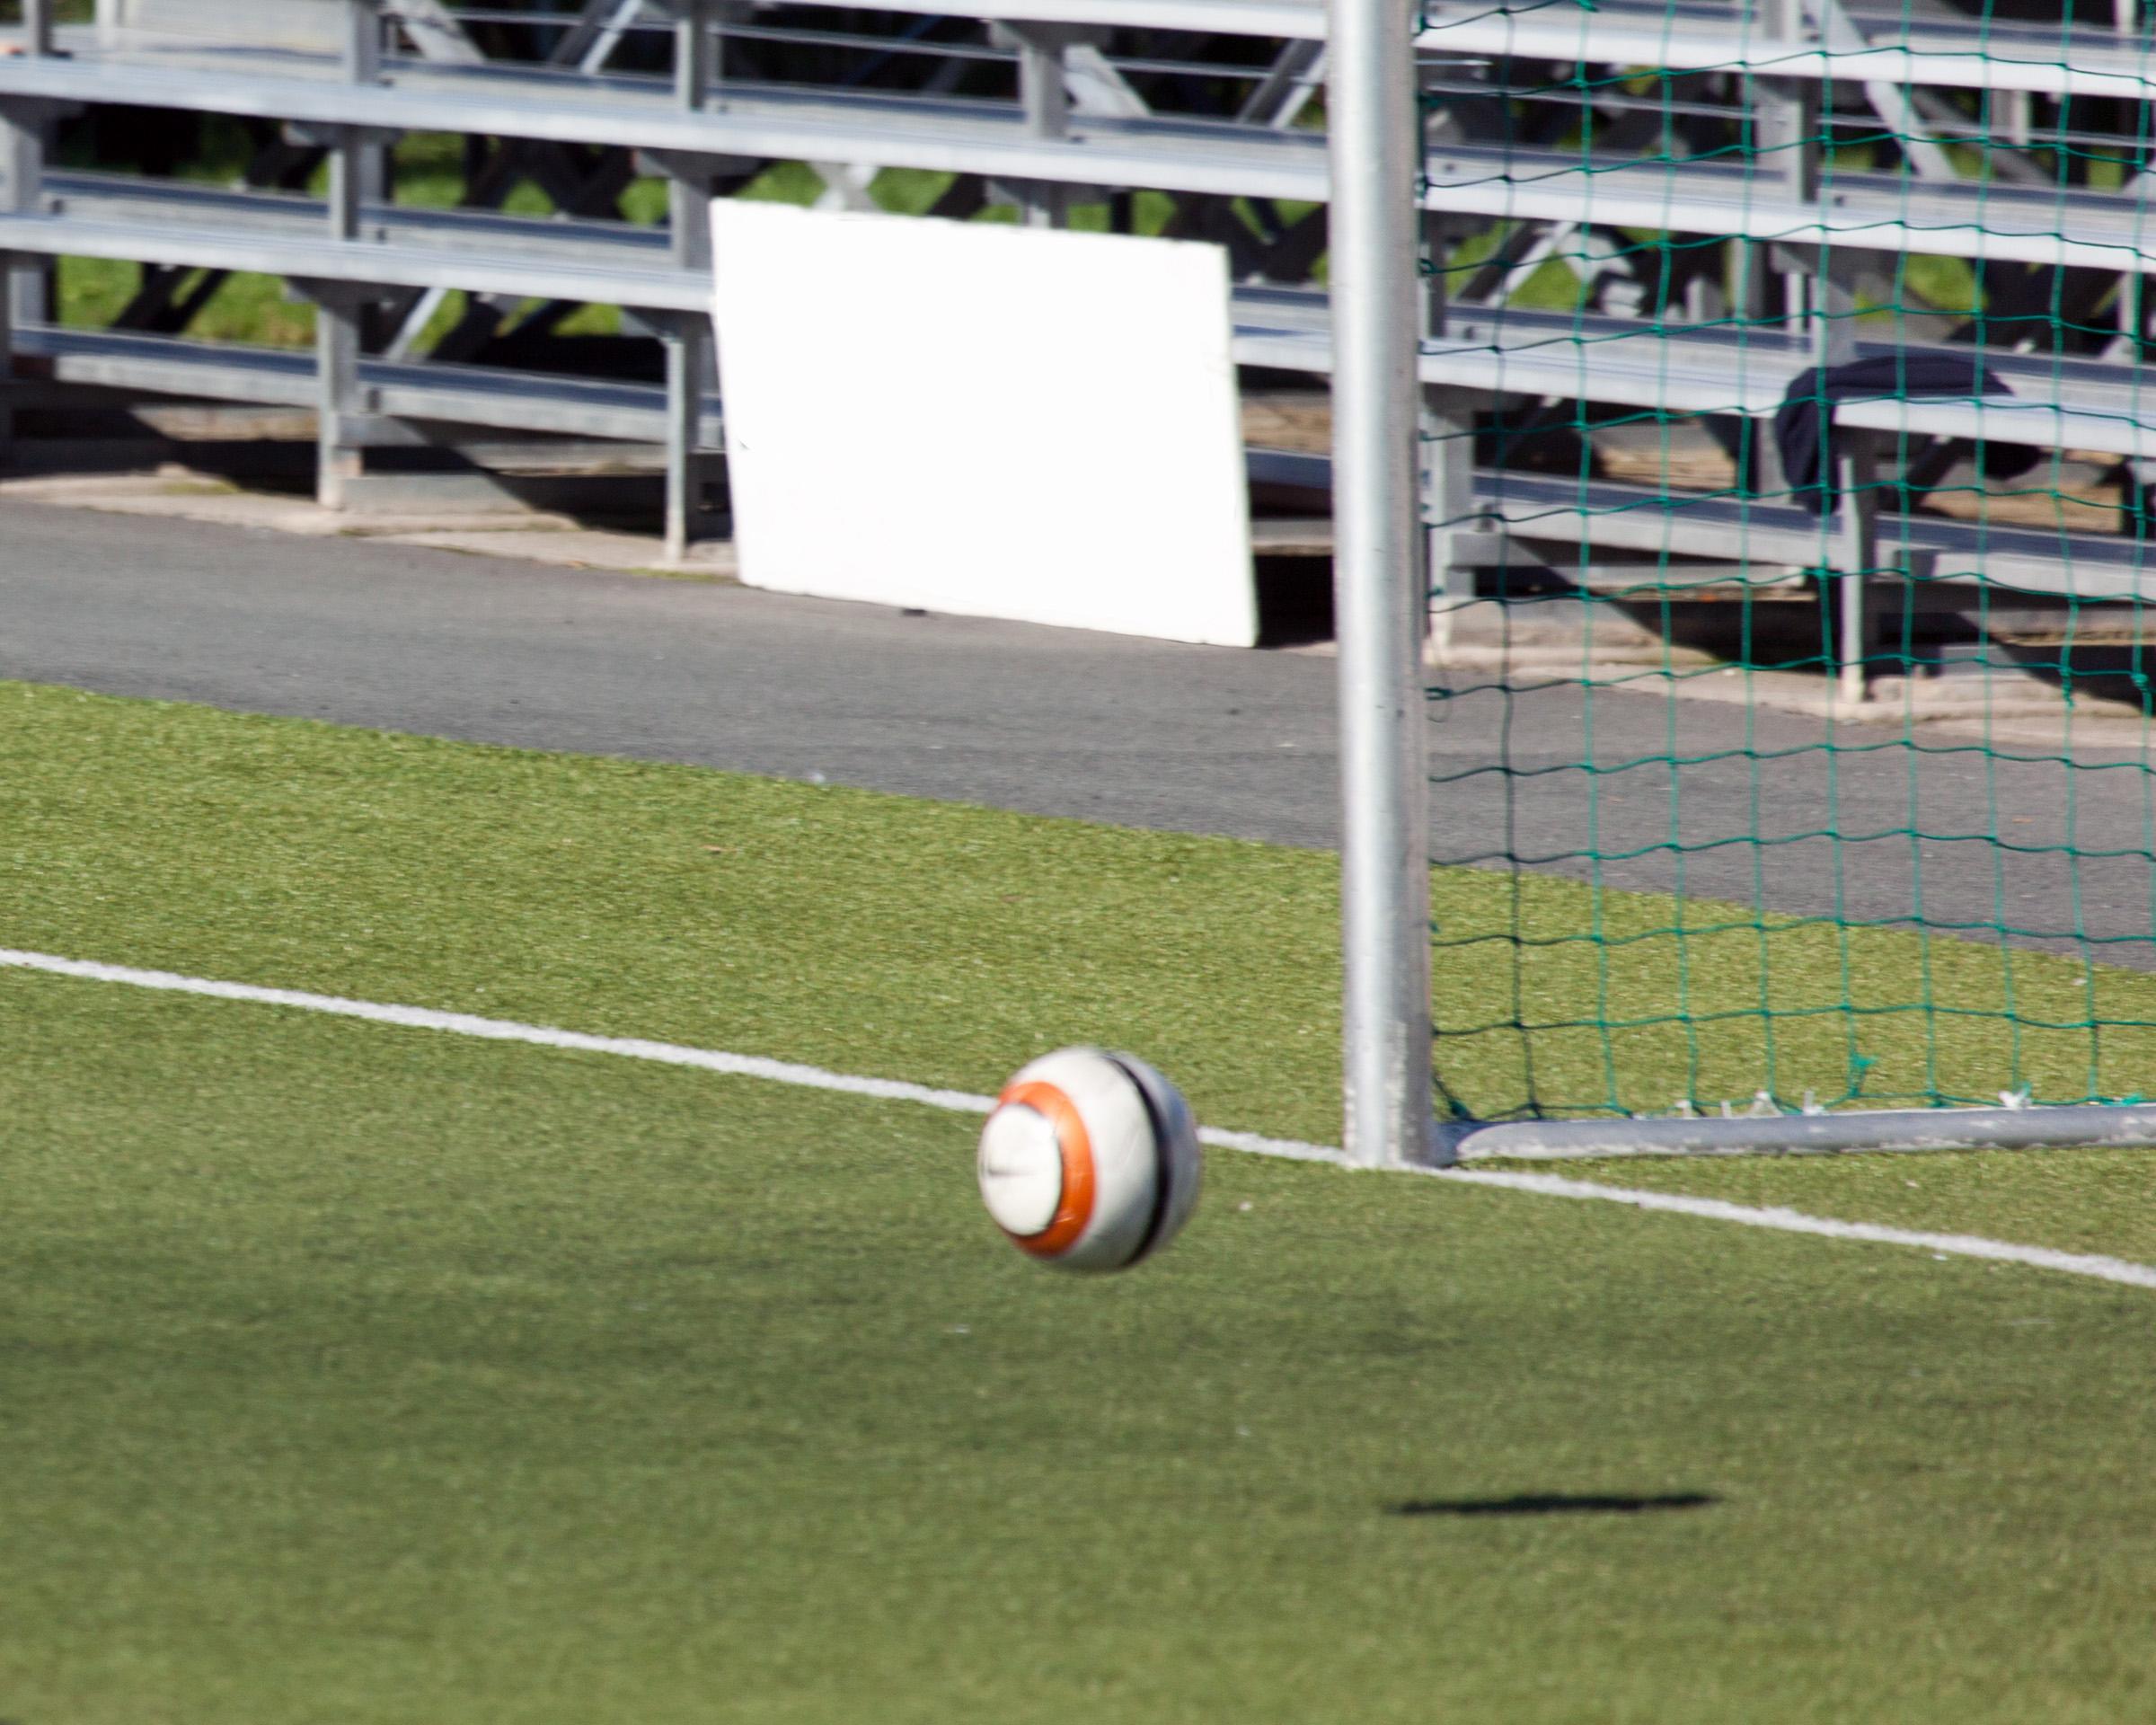 Soccer, Activity, Season, Net, Netting, HQ Photo